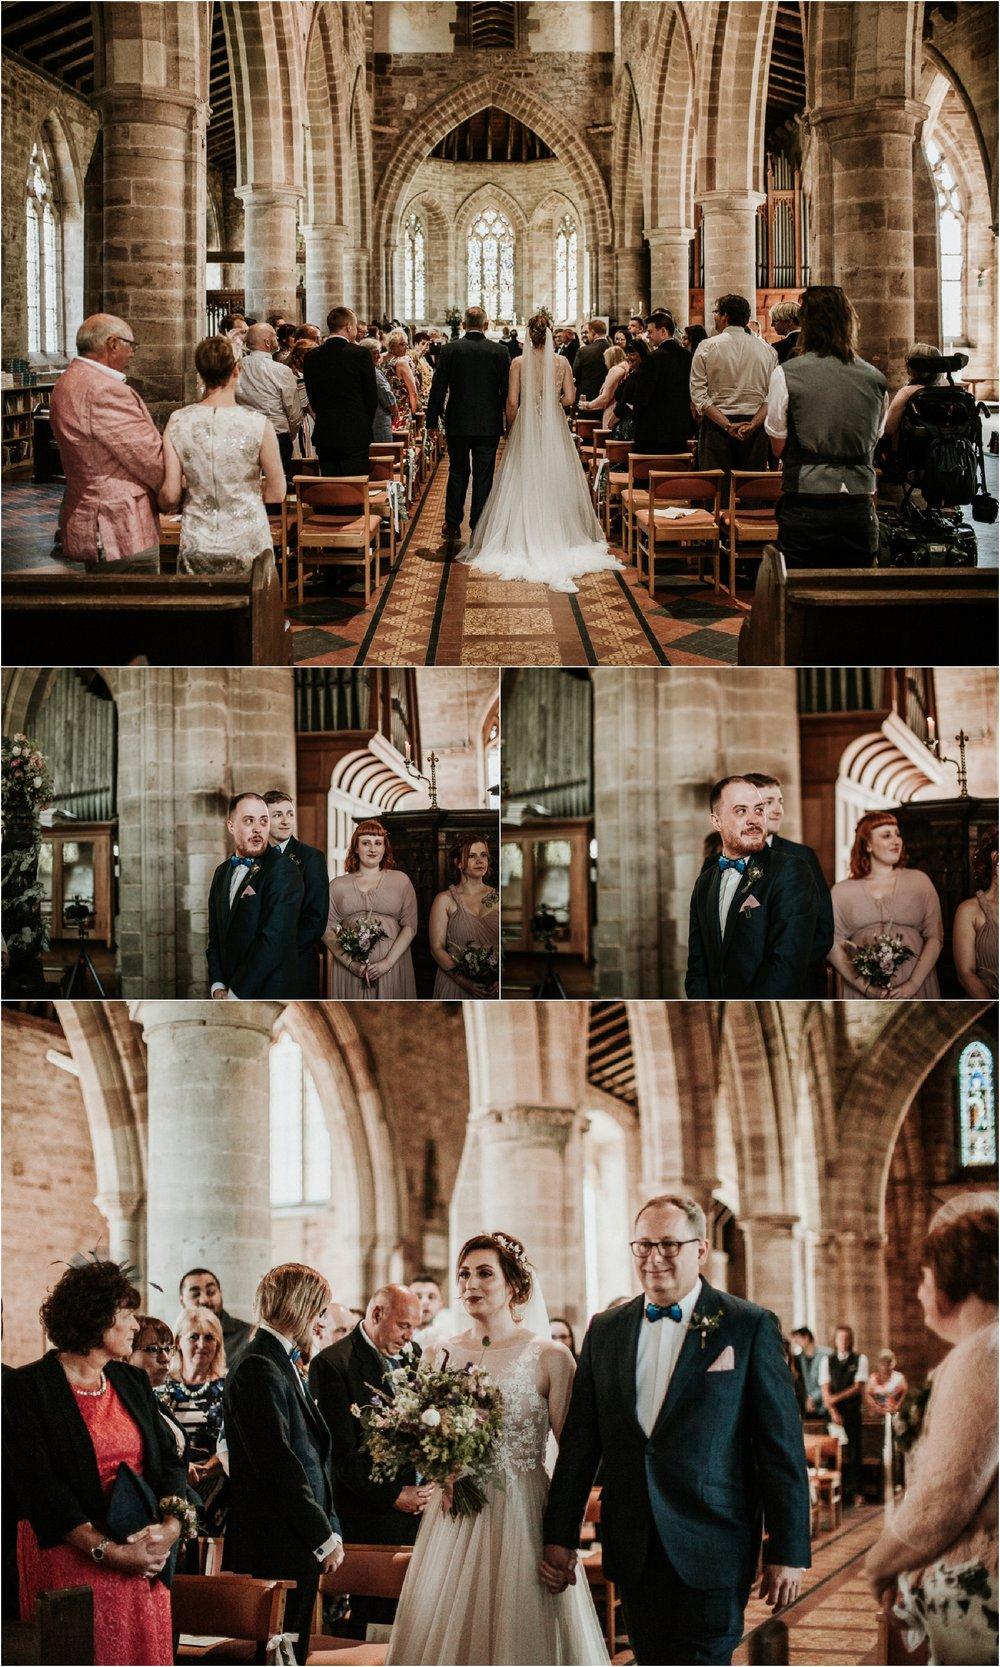 Herefordshire-uk-wedding-photographer_0046.jpg